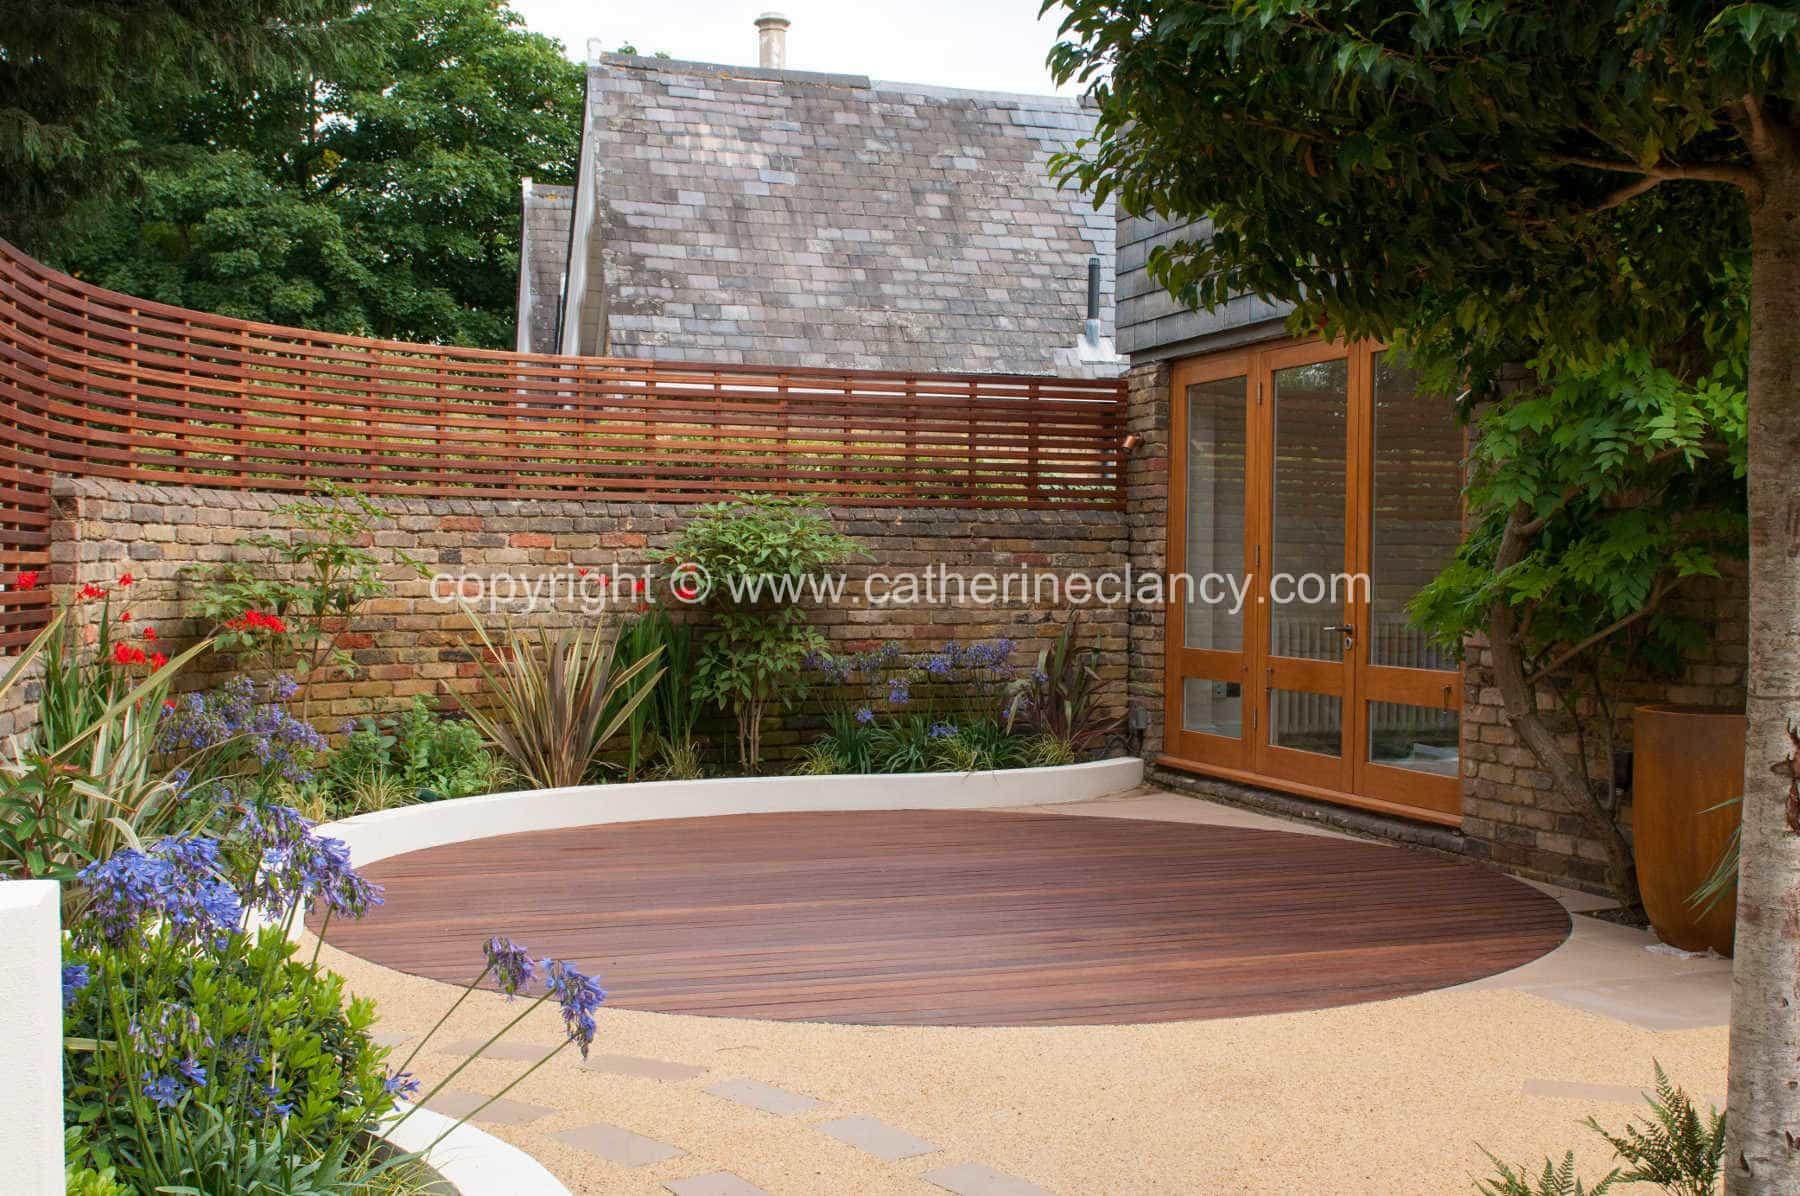 blackheath-courtyard-9